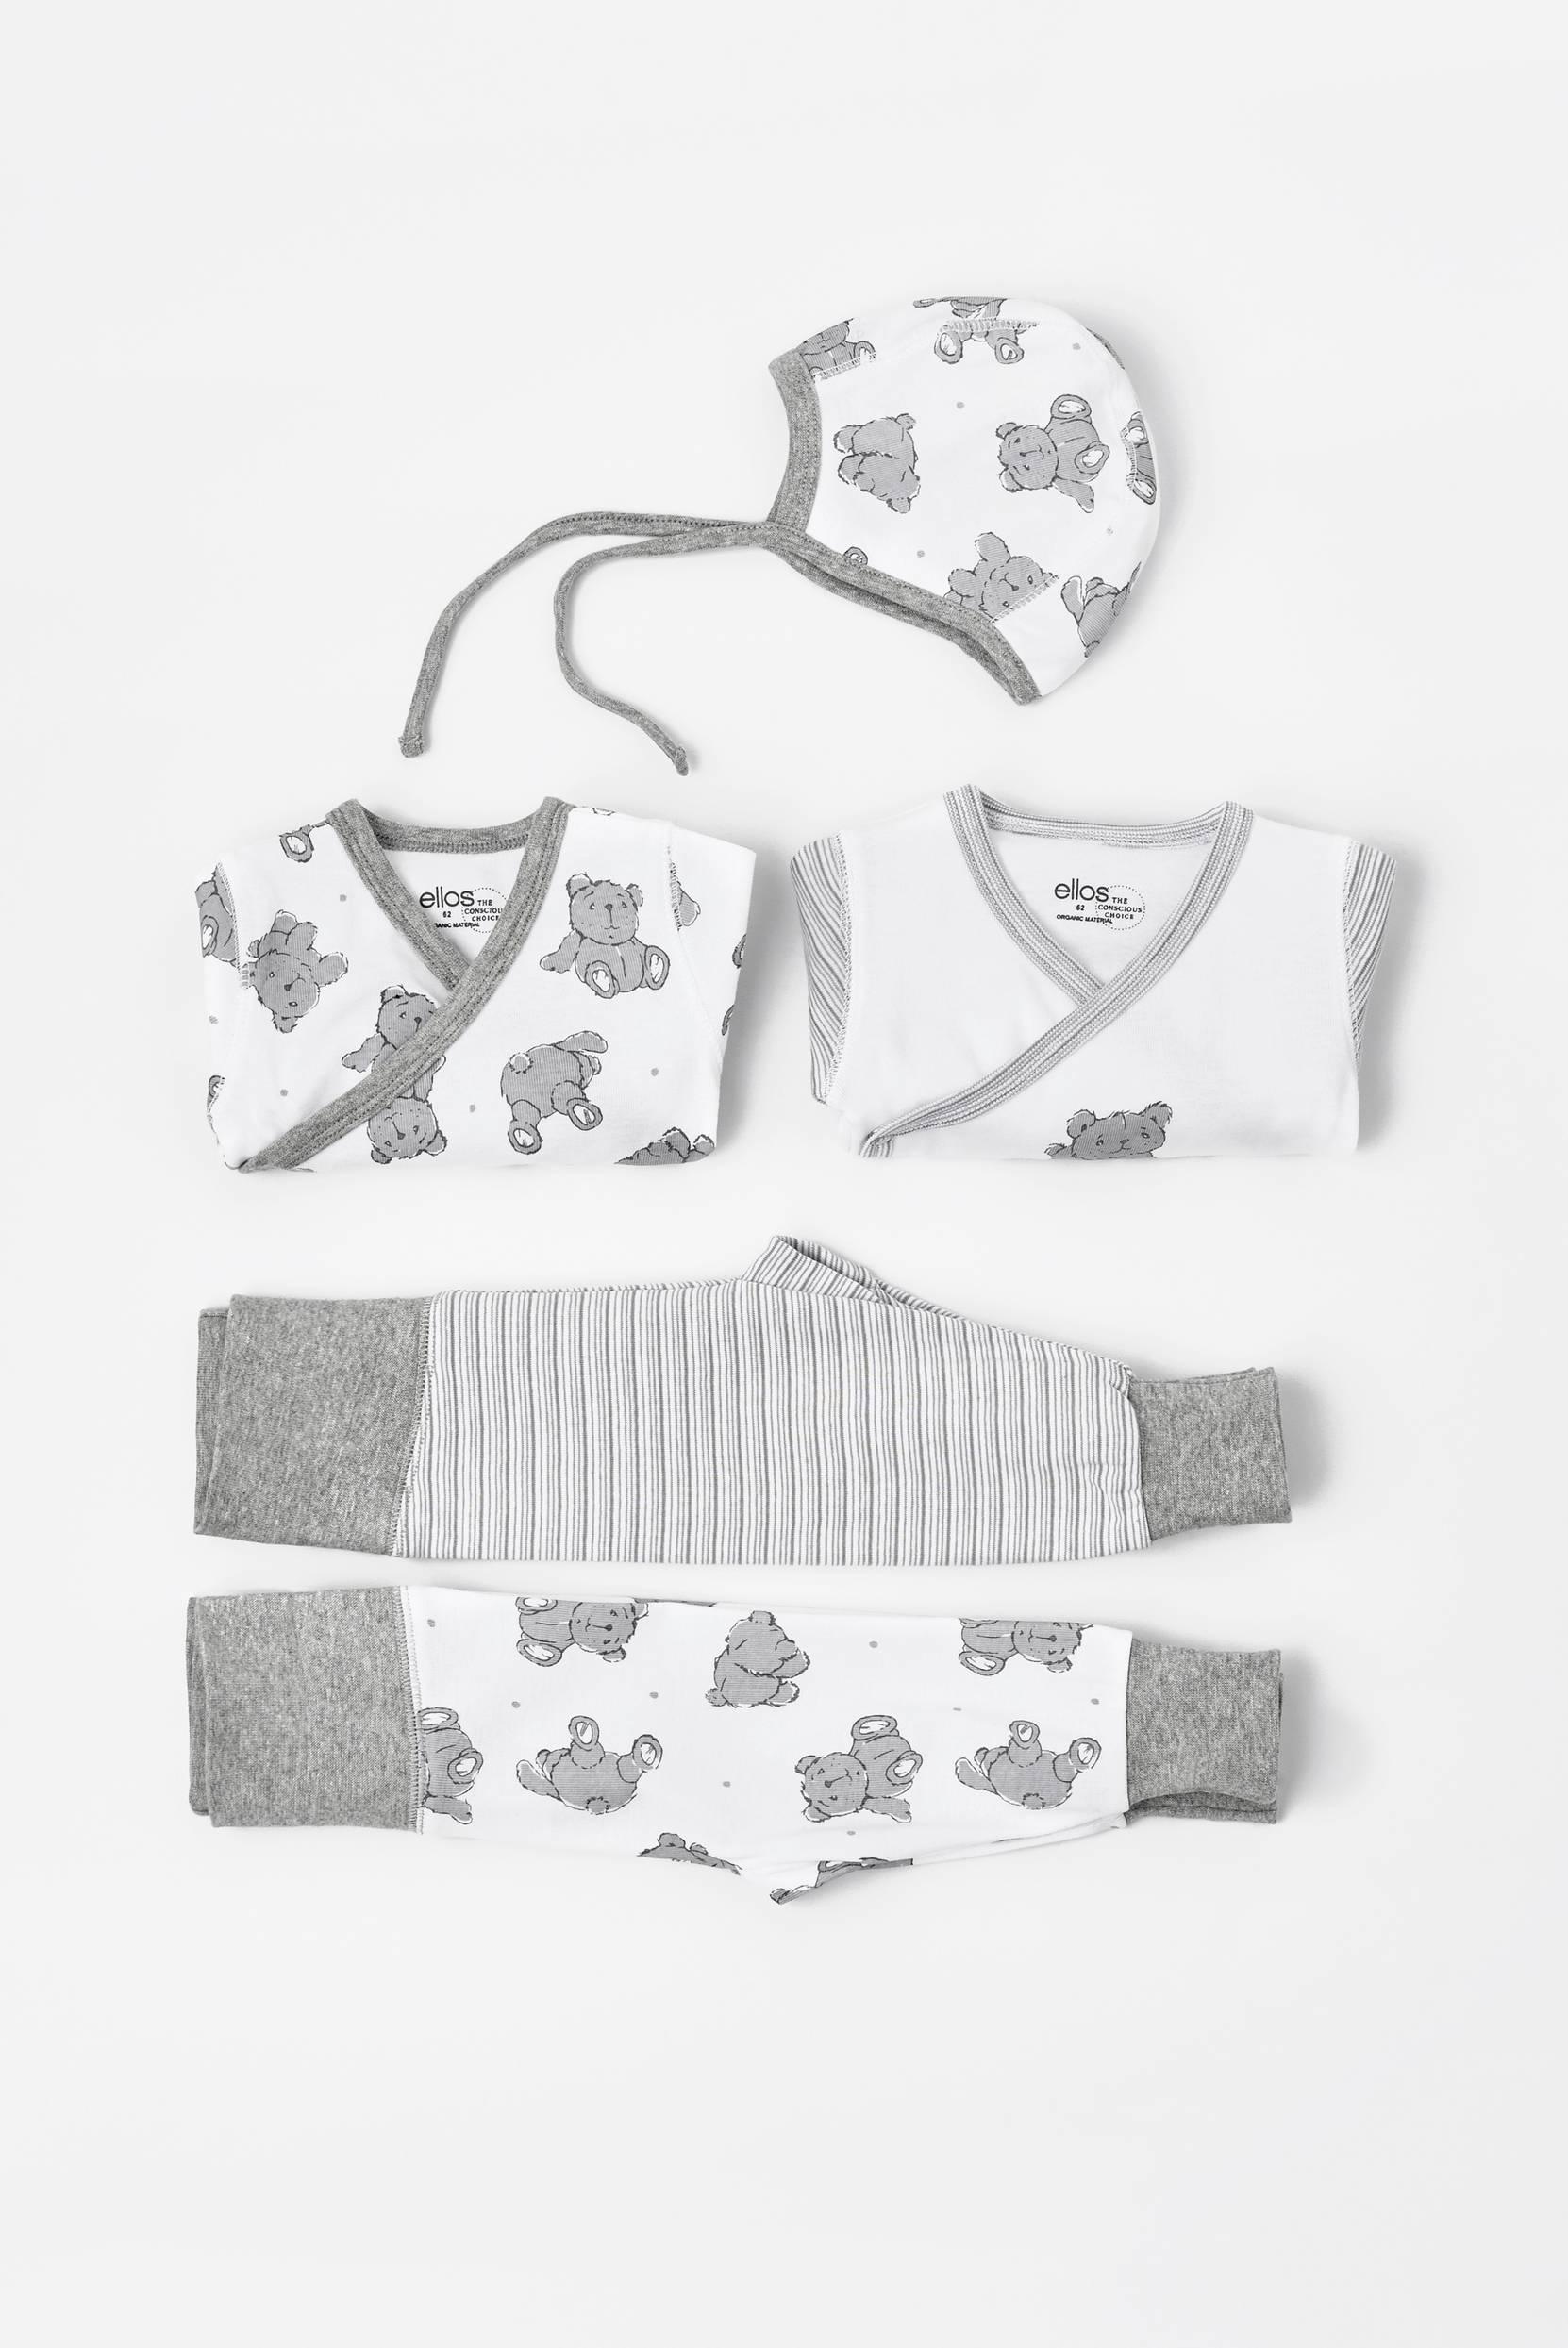 Startpaket Fideli för baby, 5 delar i ekologisk bomull thumbnail